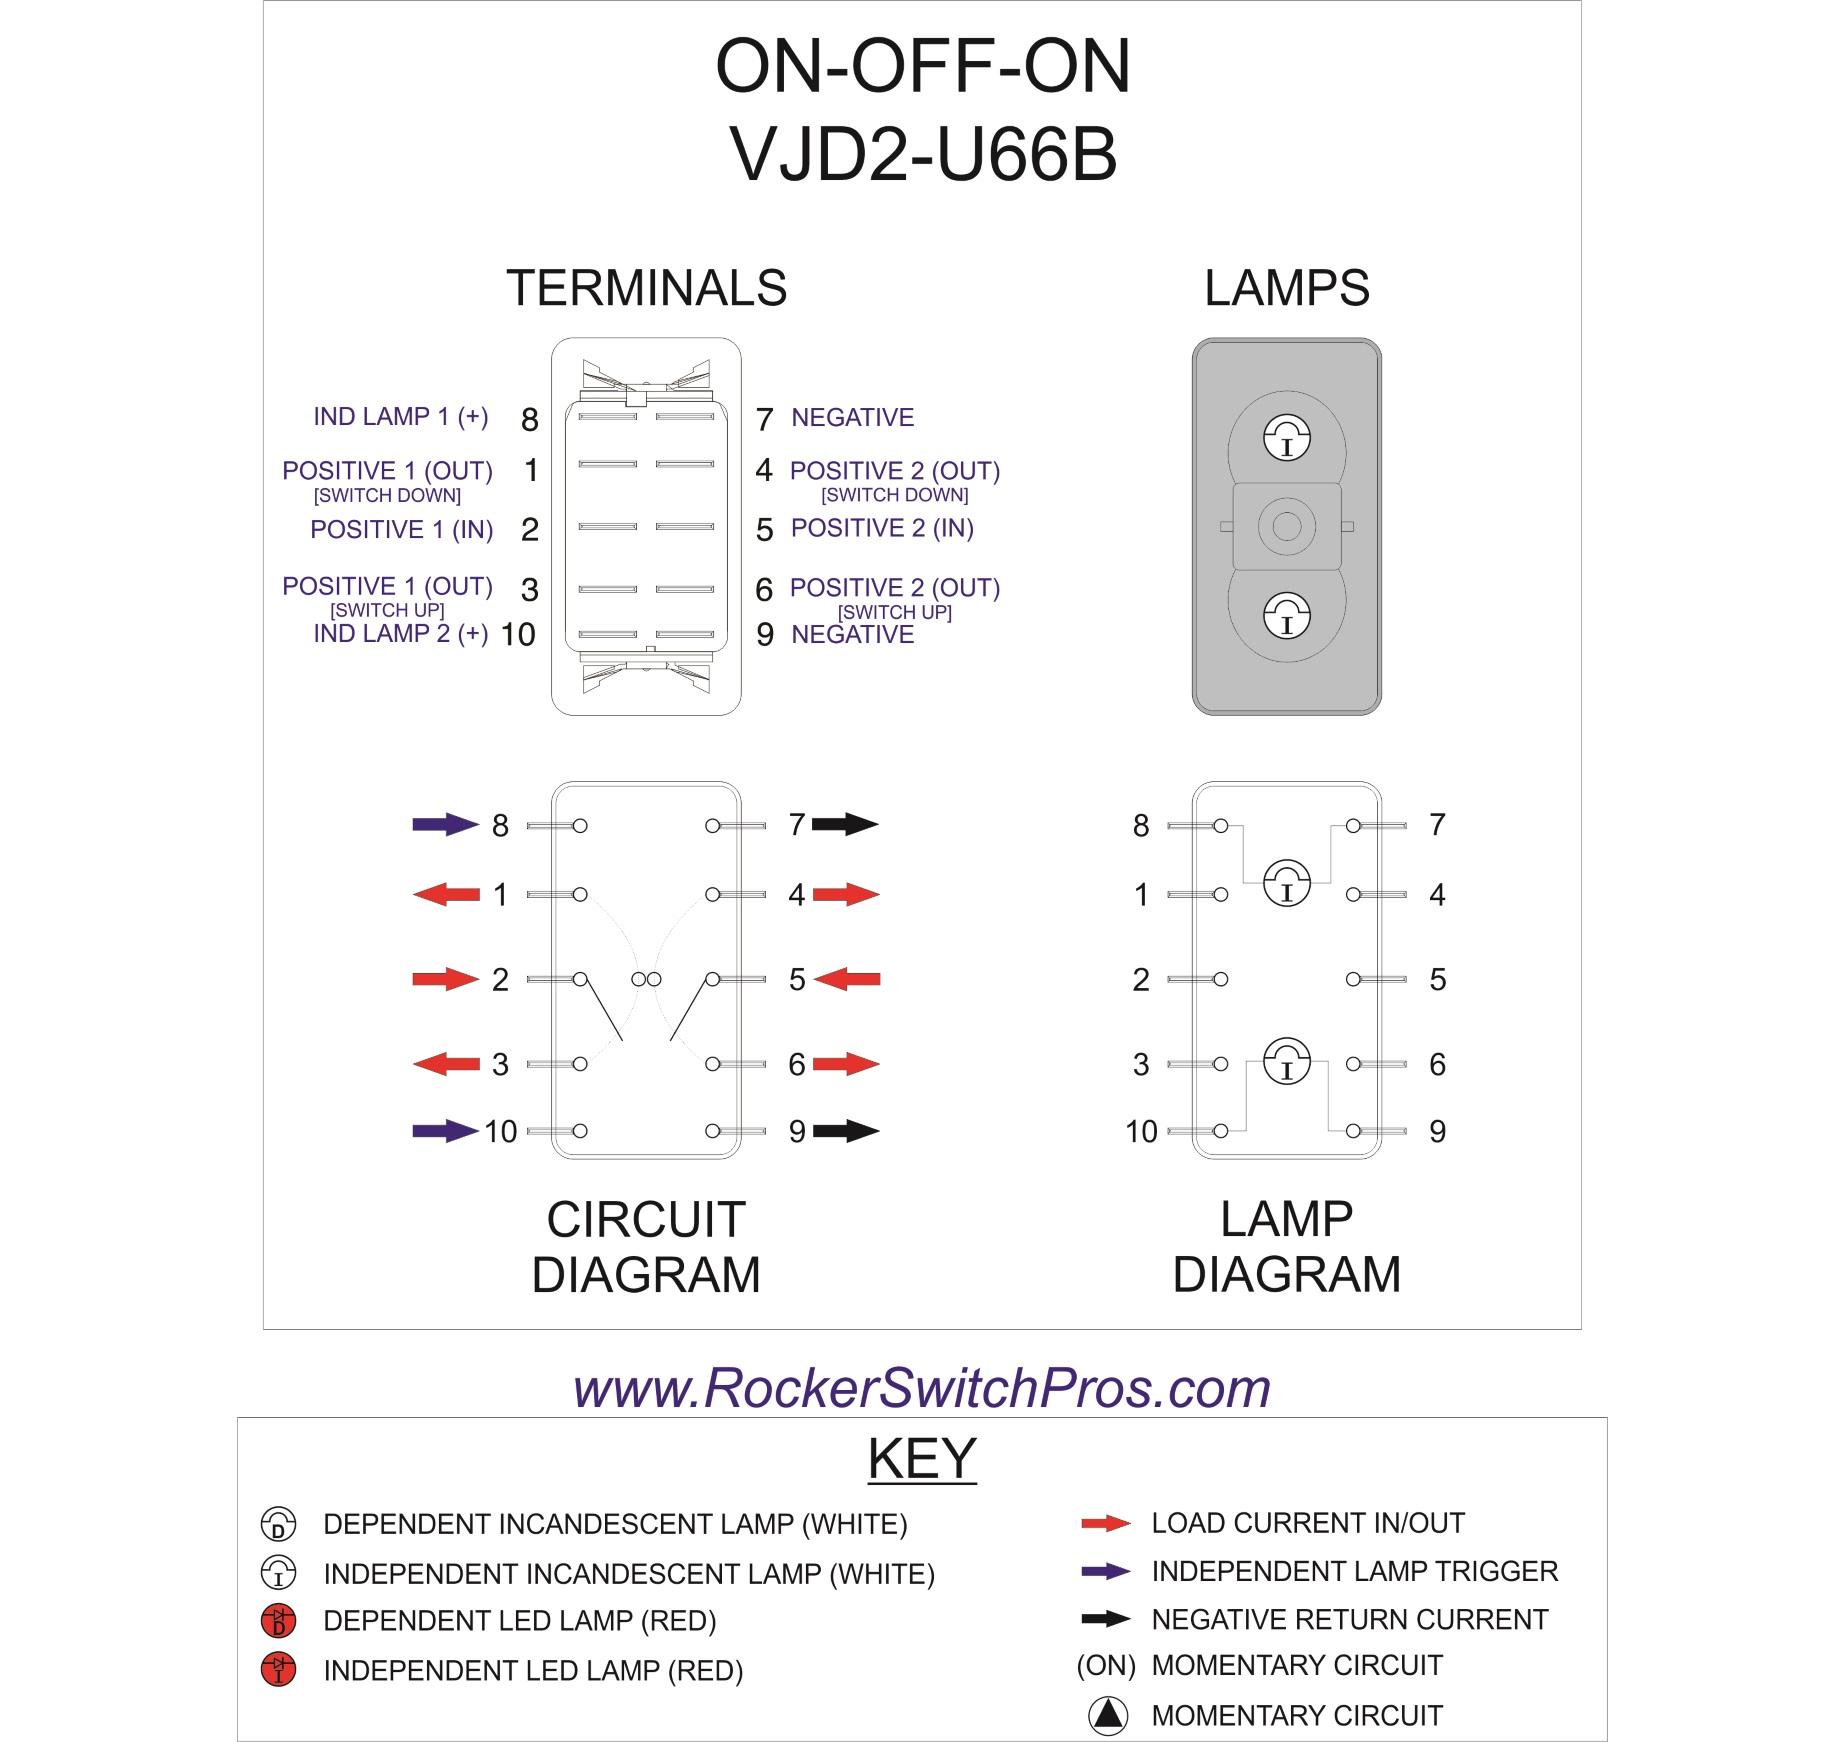 Dpdt Rocker Switch | On-Off-On | 2 Ind Lamps - Carling Rocker Switch Wiring Diagram